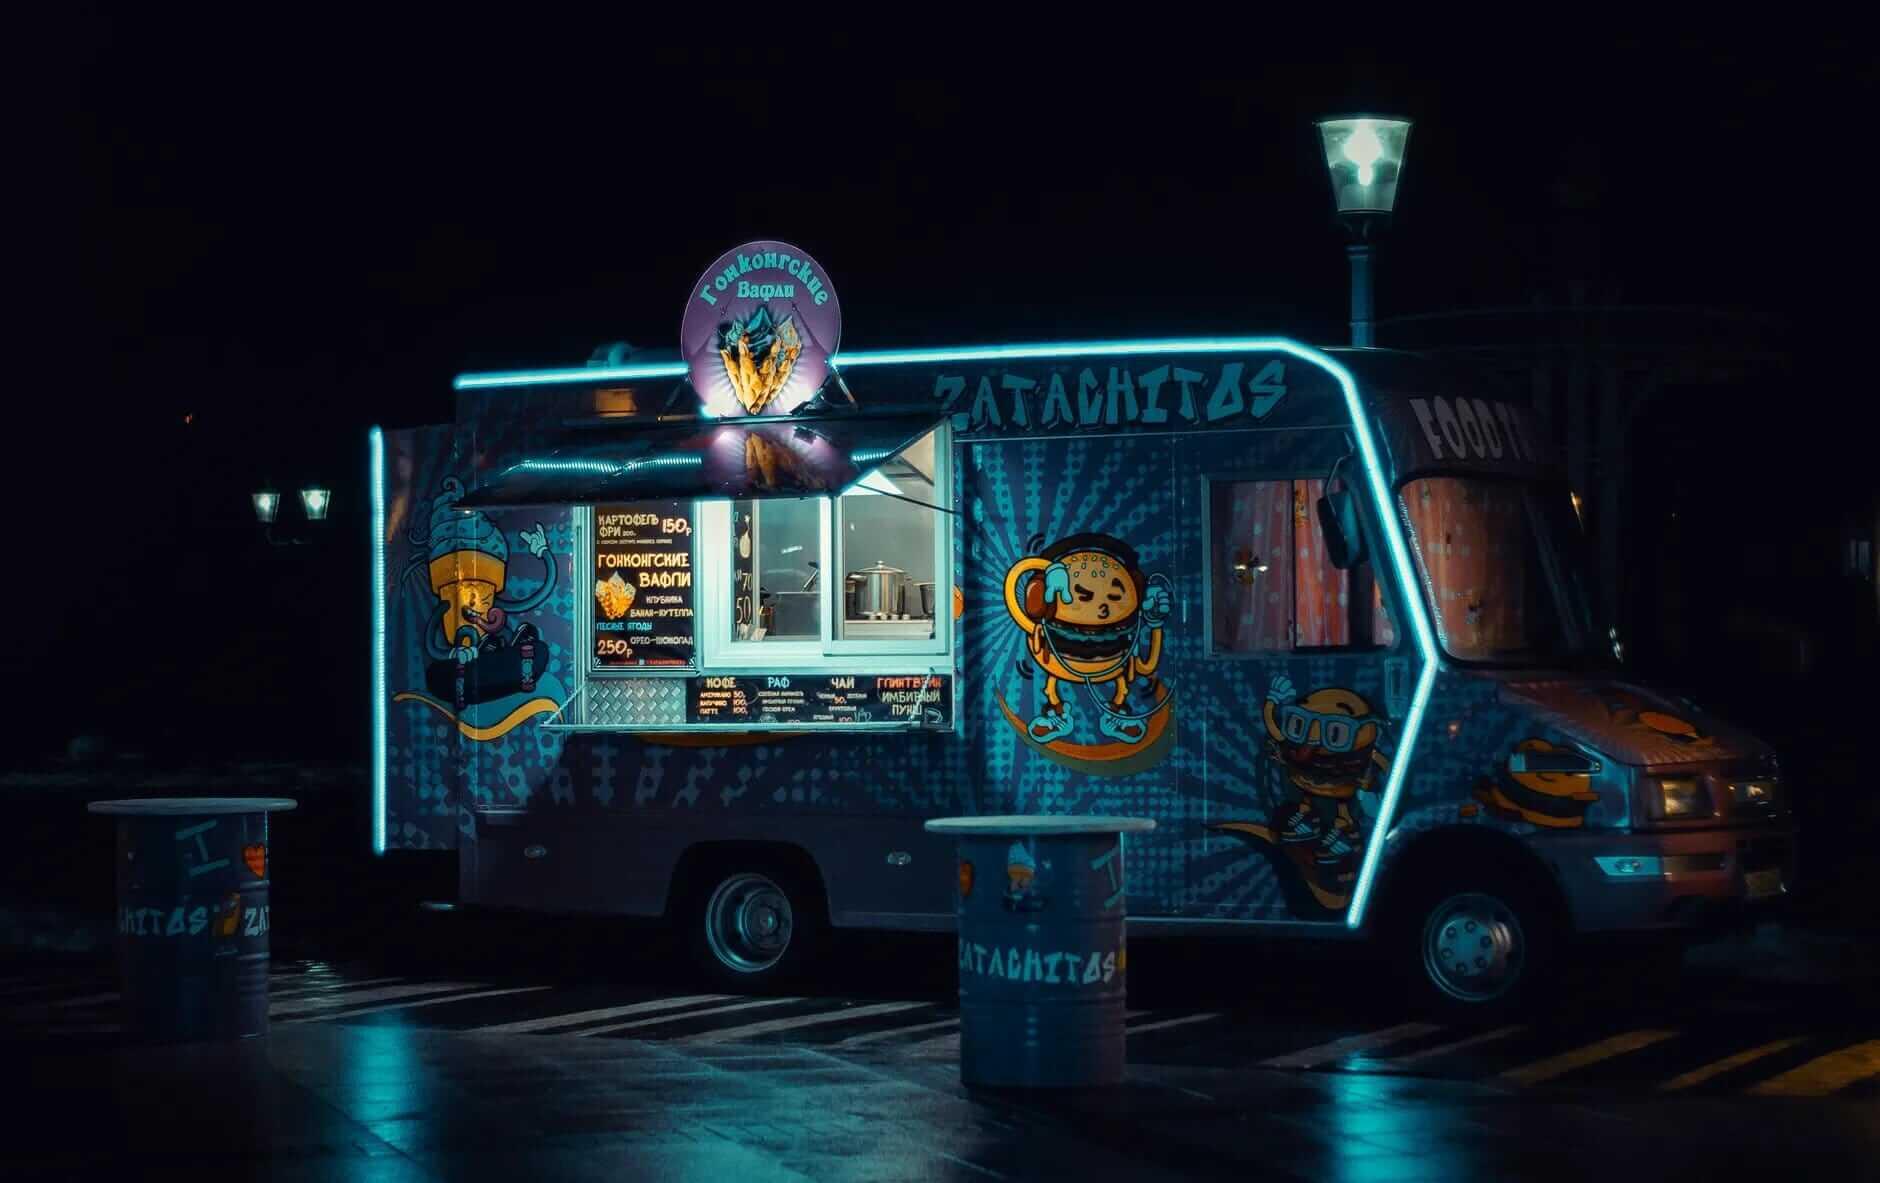 Local Food Trucks in Boston